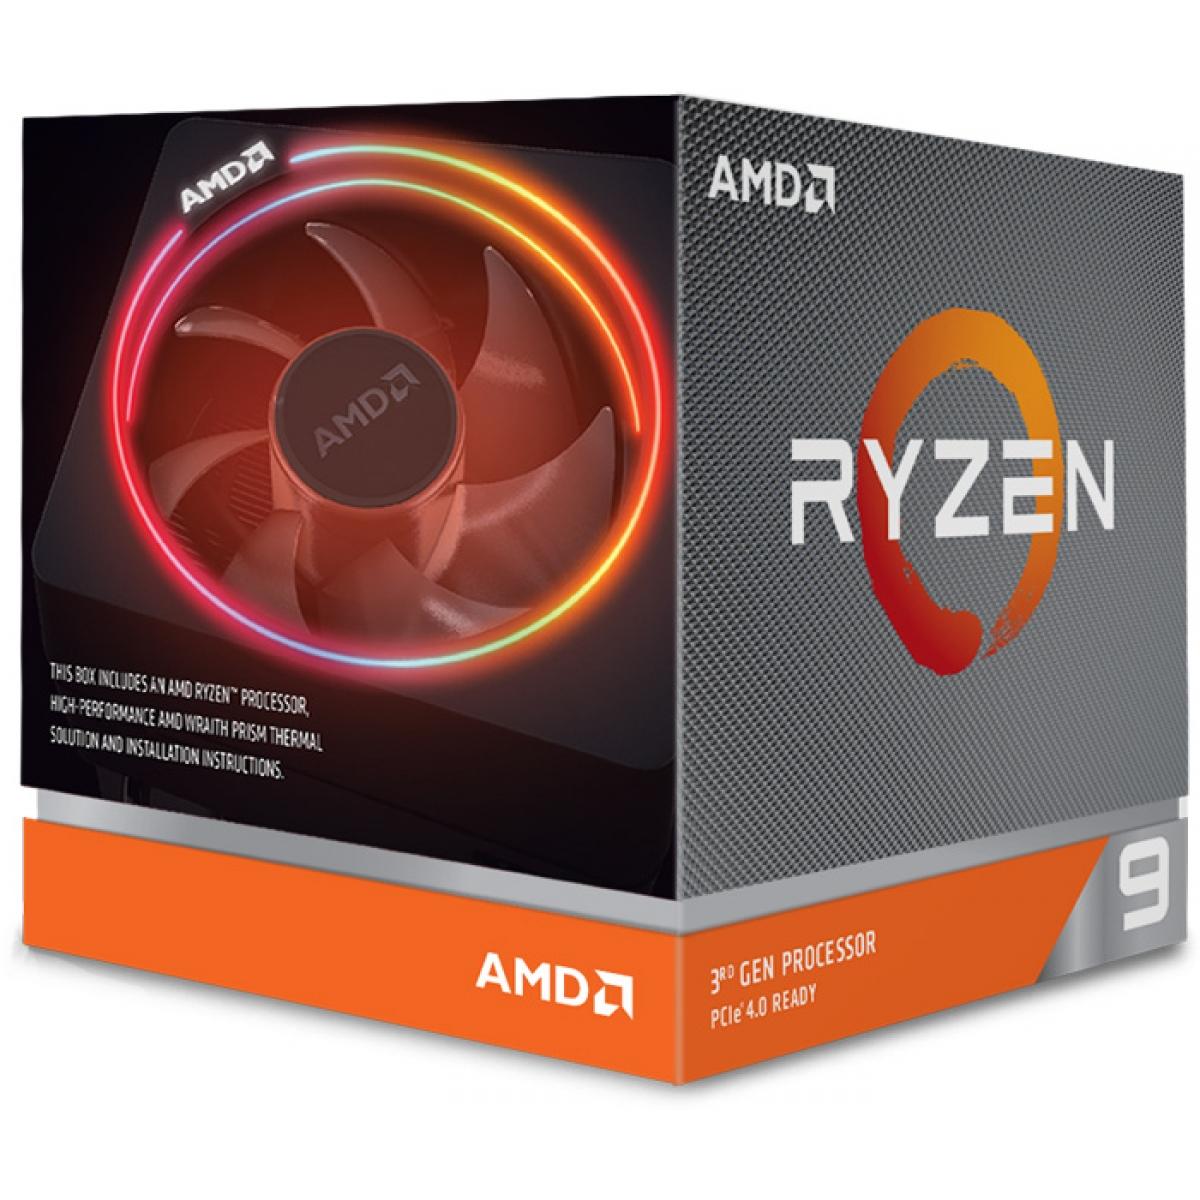 Processador AMD Ryzen 9 3900x 3.8ghz (4.6ghz Turbo), 12-cores 24-threads, Wraith Prism RGB, AM4, 100-100000023BOX, S/ Video